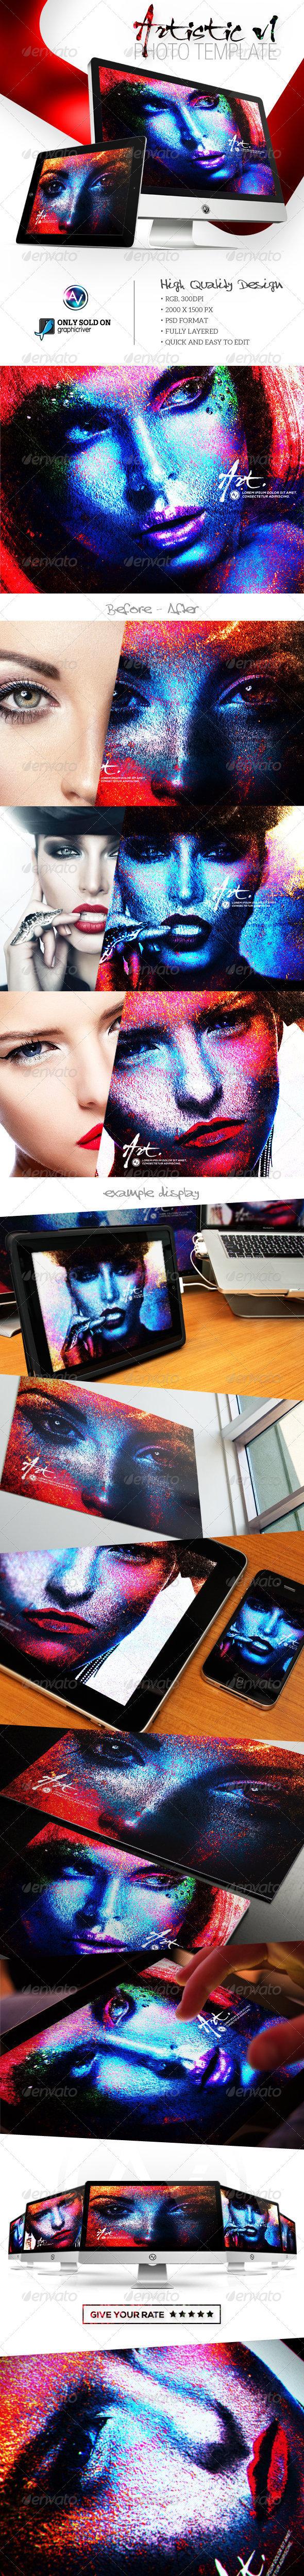 Artistic Photo Template V1 - Artistic Photo Templates